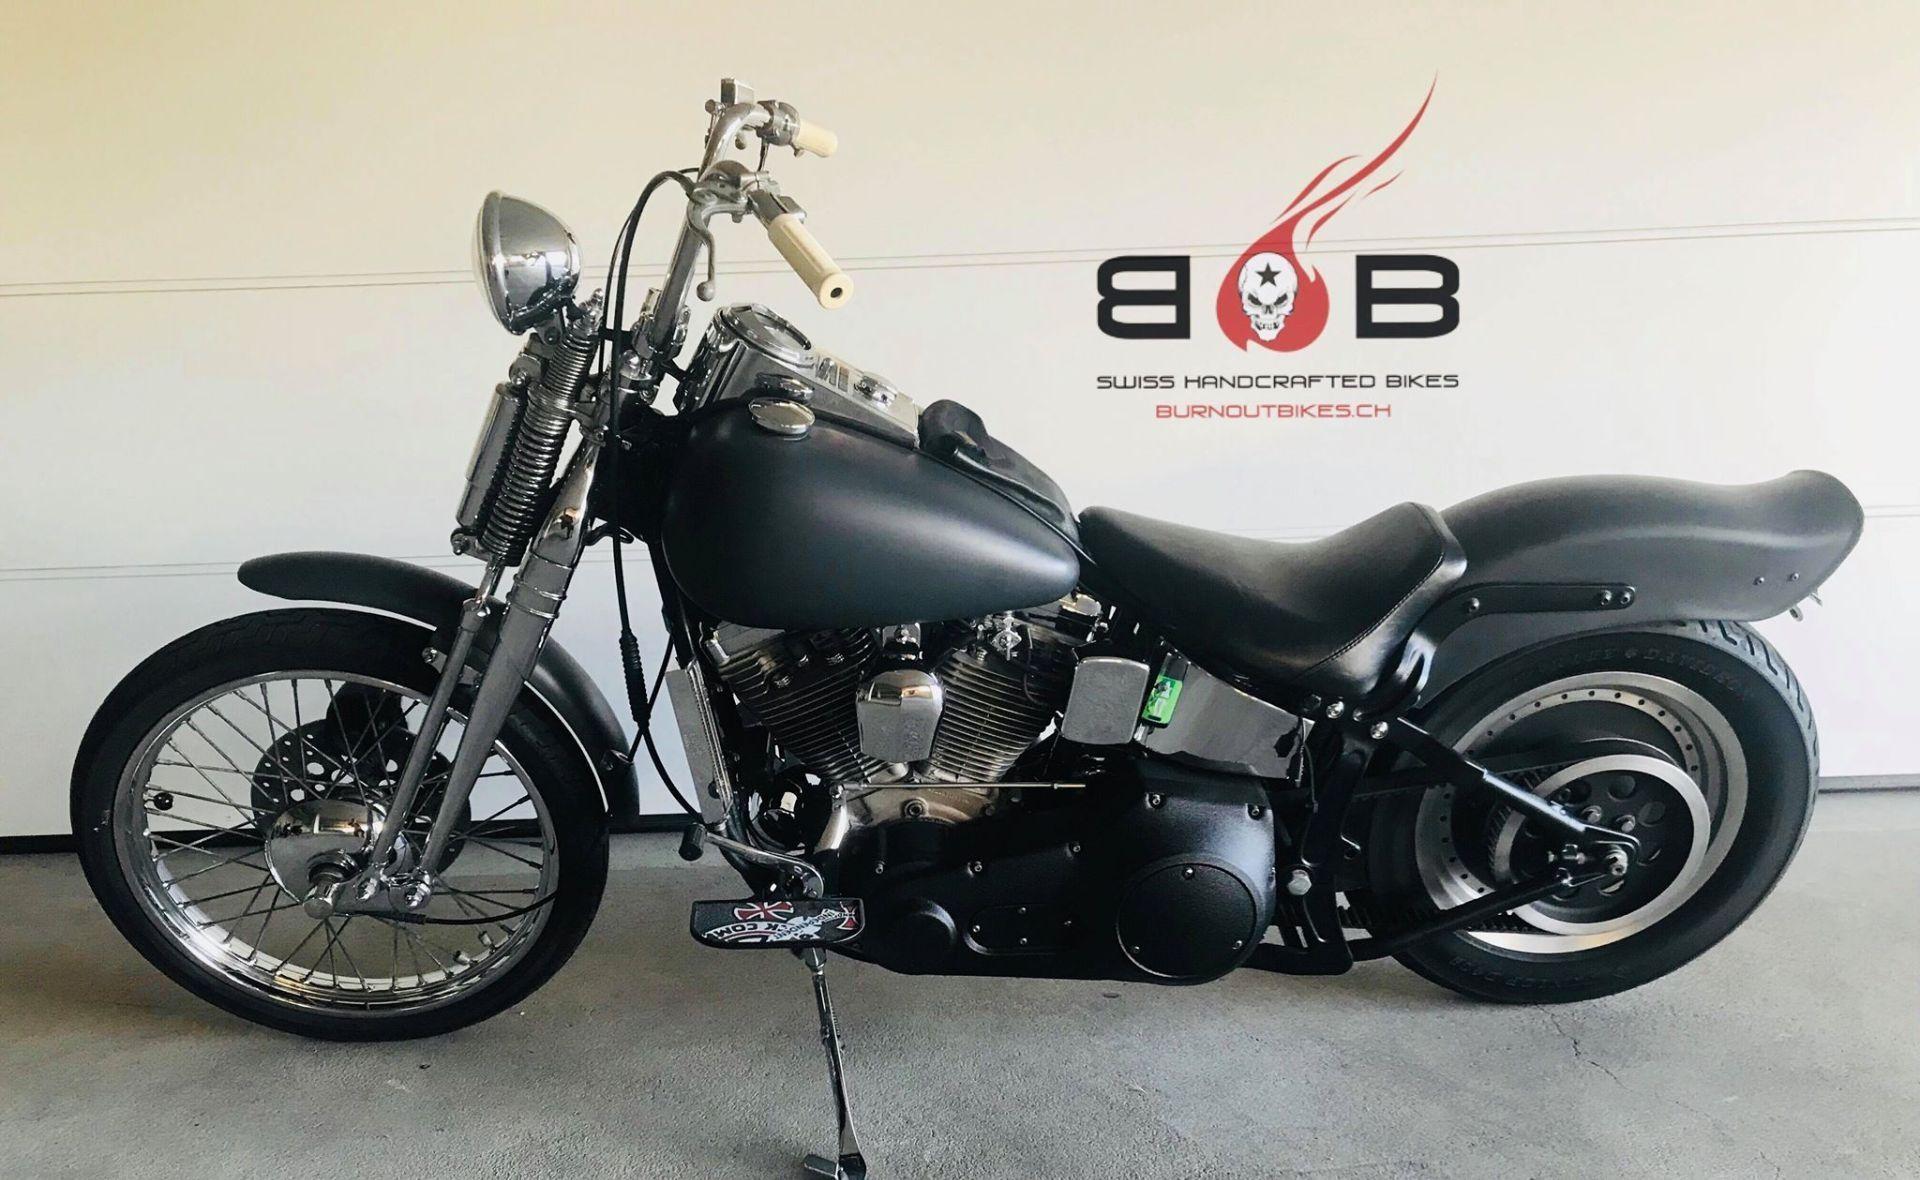 moto occasions acheter harley davidson fxstc 1340 softail custom springer burn out bikes frauenfeld. Black Bedroom Furniture Sets. Home Design Ideas